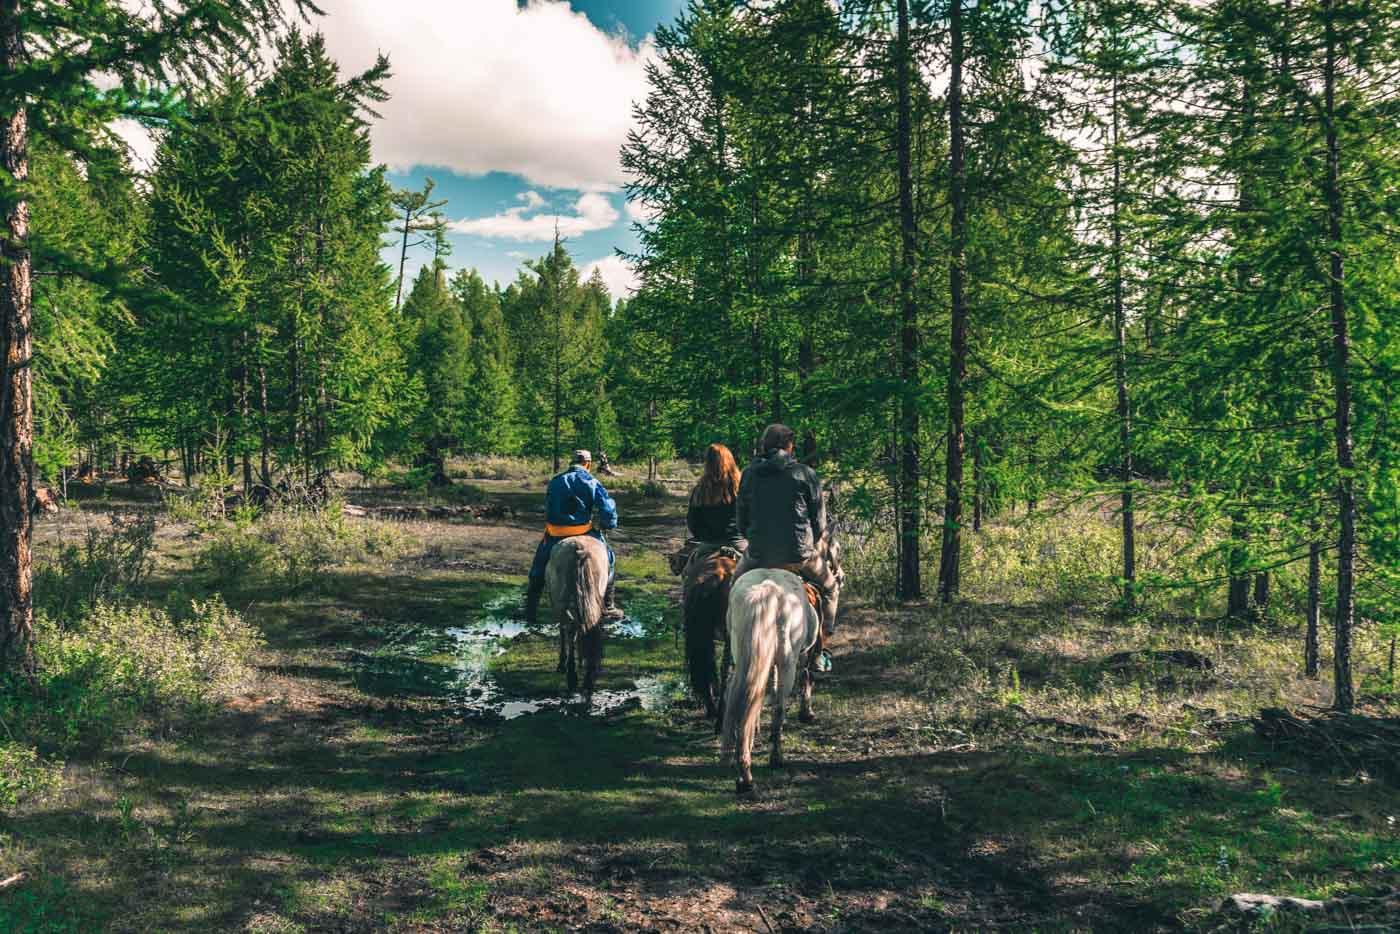 Horseback riding in pine forest